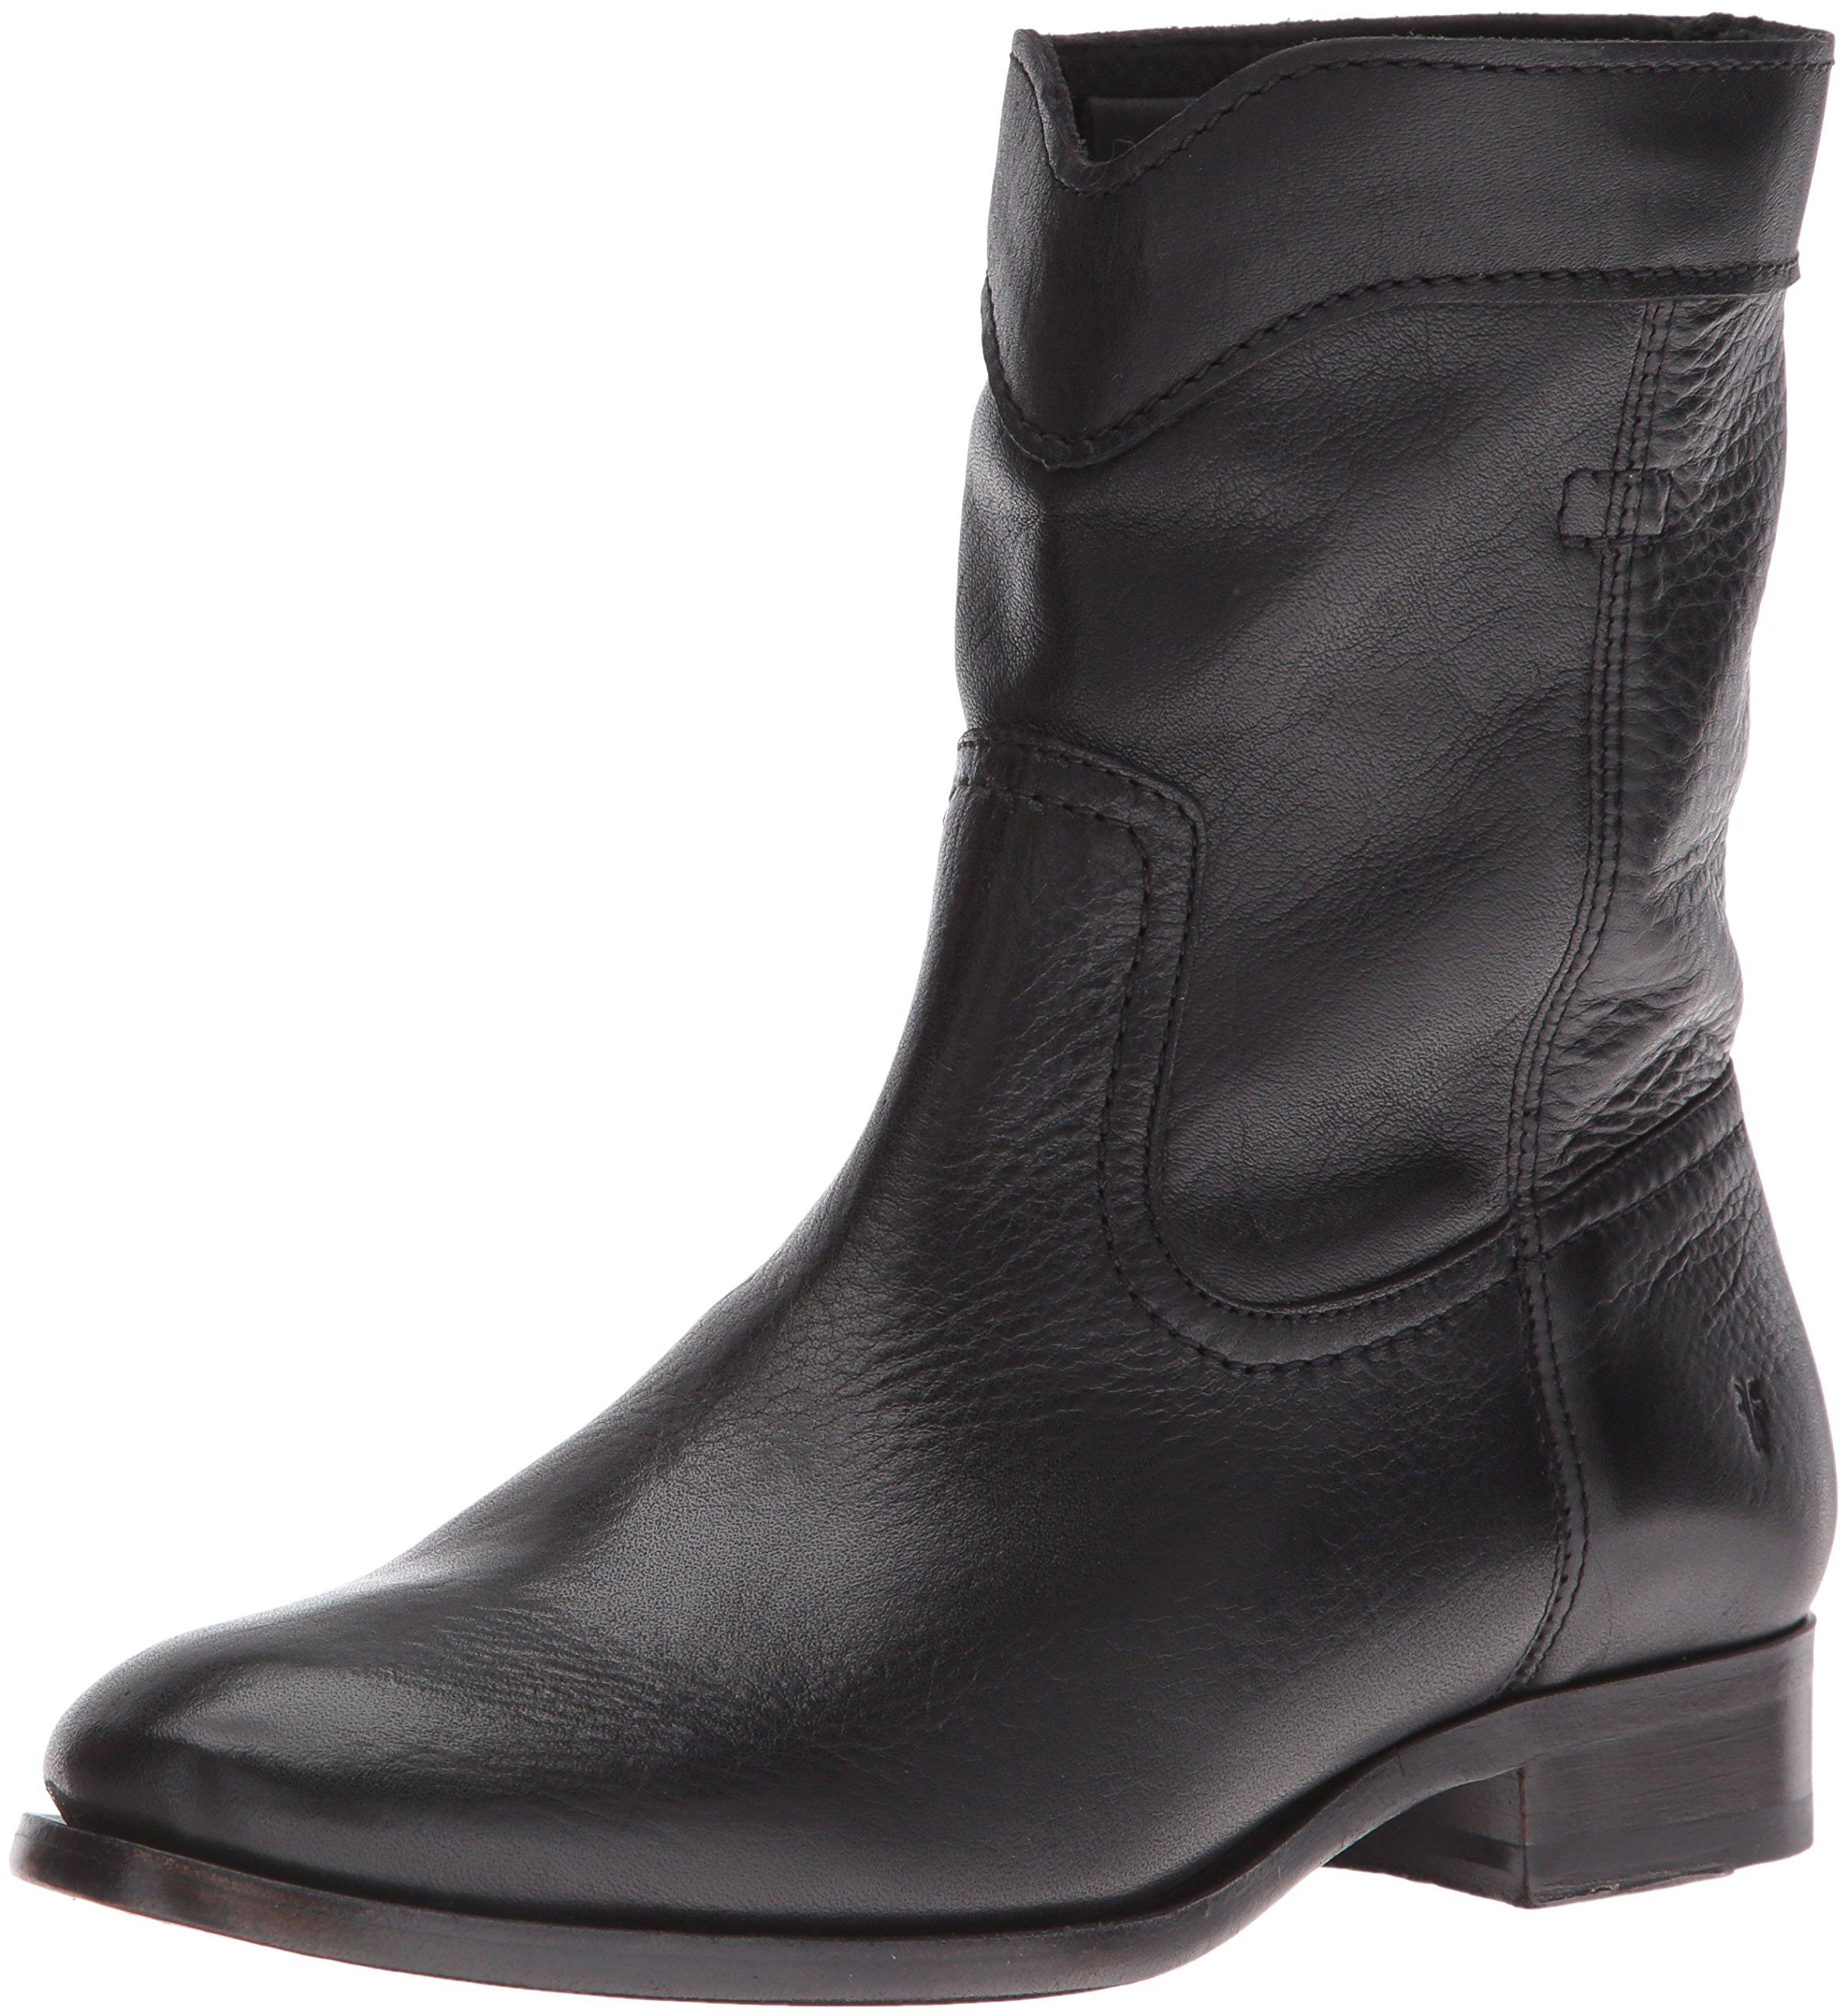 FRYE Women's Cara Roper Short Boot, Black, 8 M US